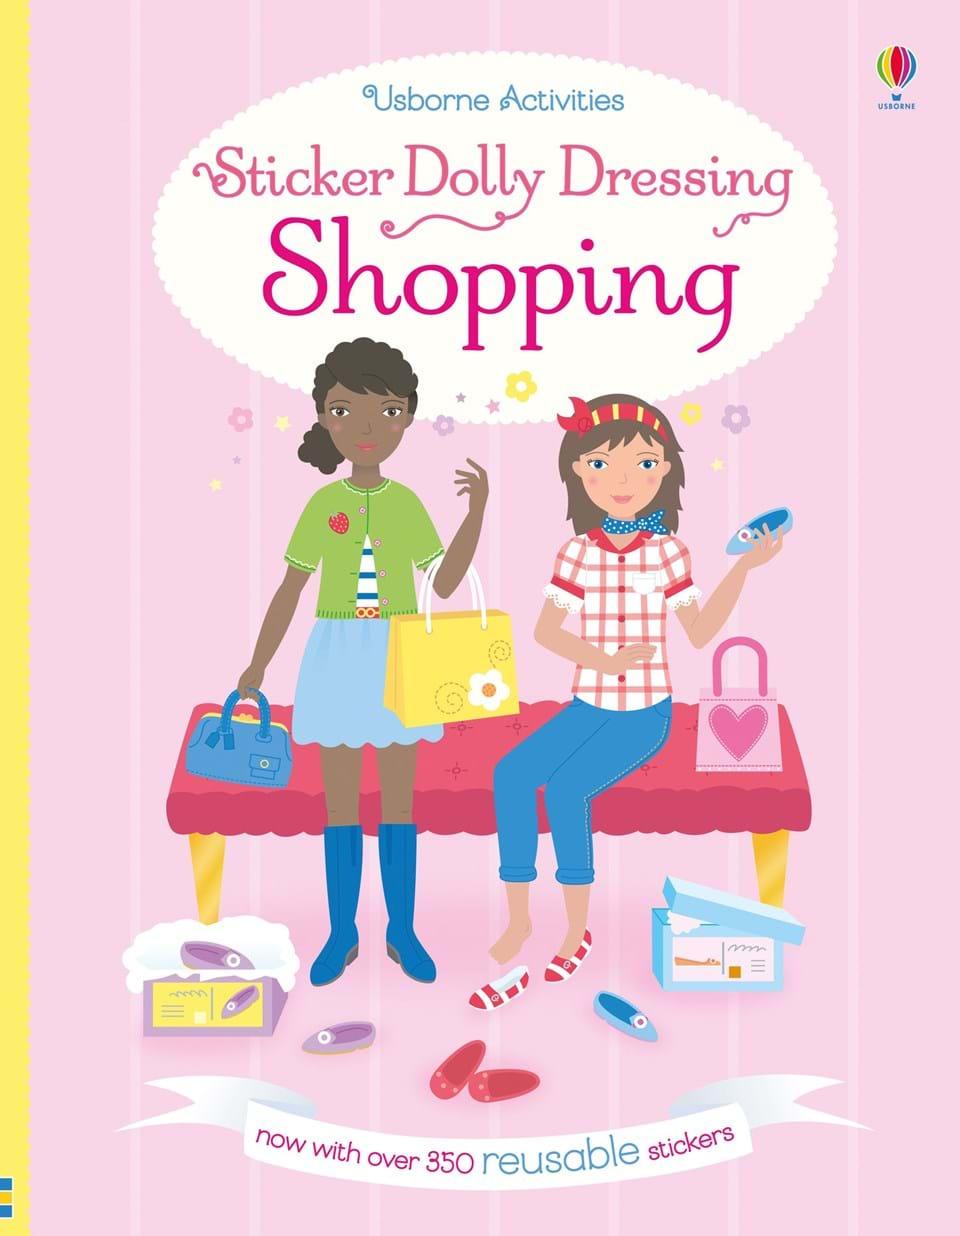 Sticker Dolly Dressing Shopping sticker dolly dressing around the world